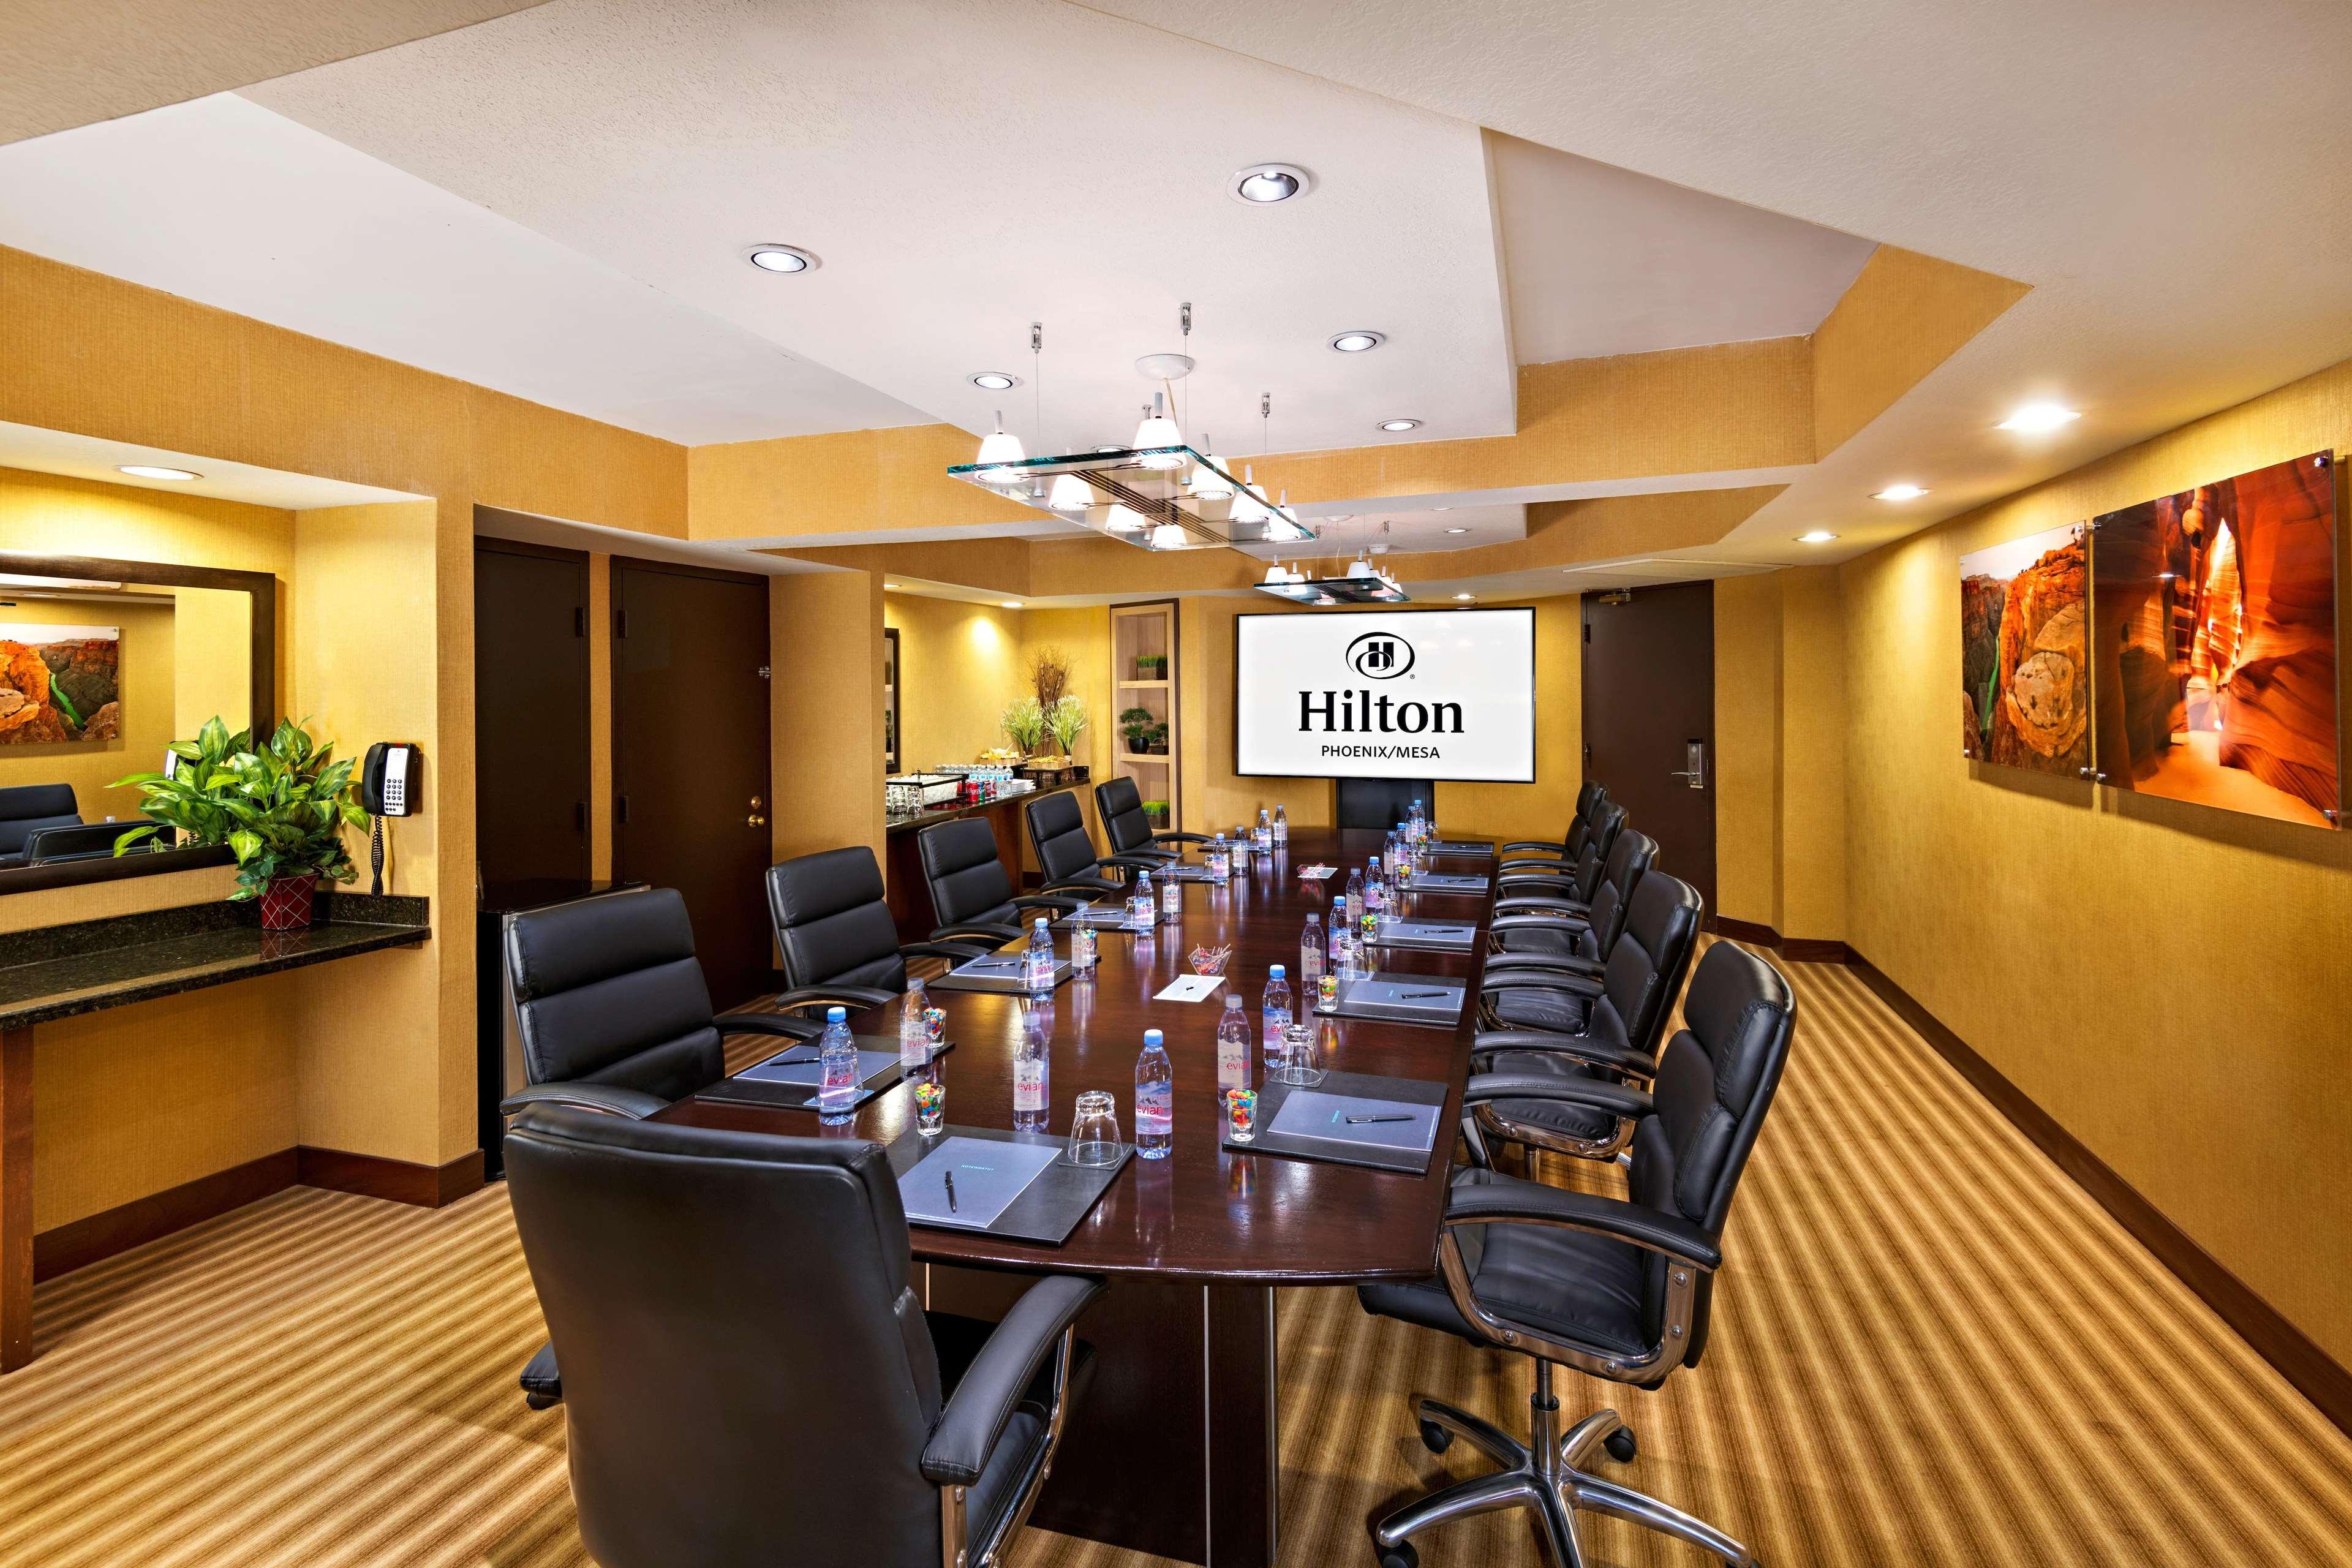 Hilton Phoenix/Mesa image 48